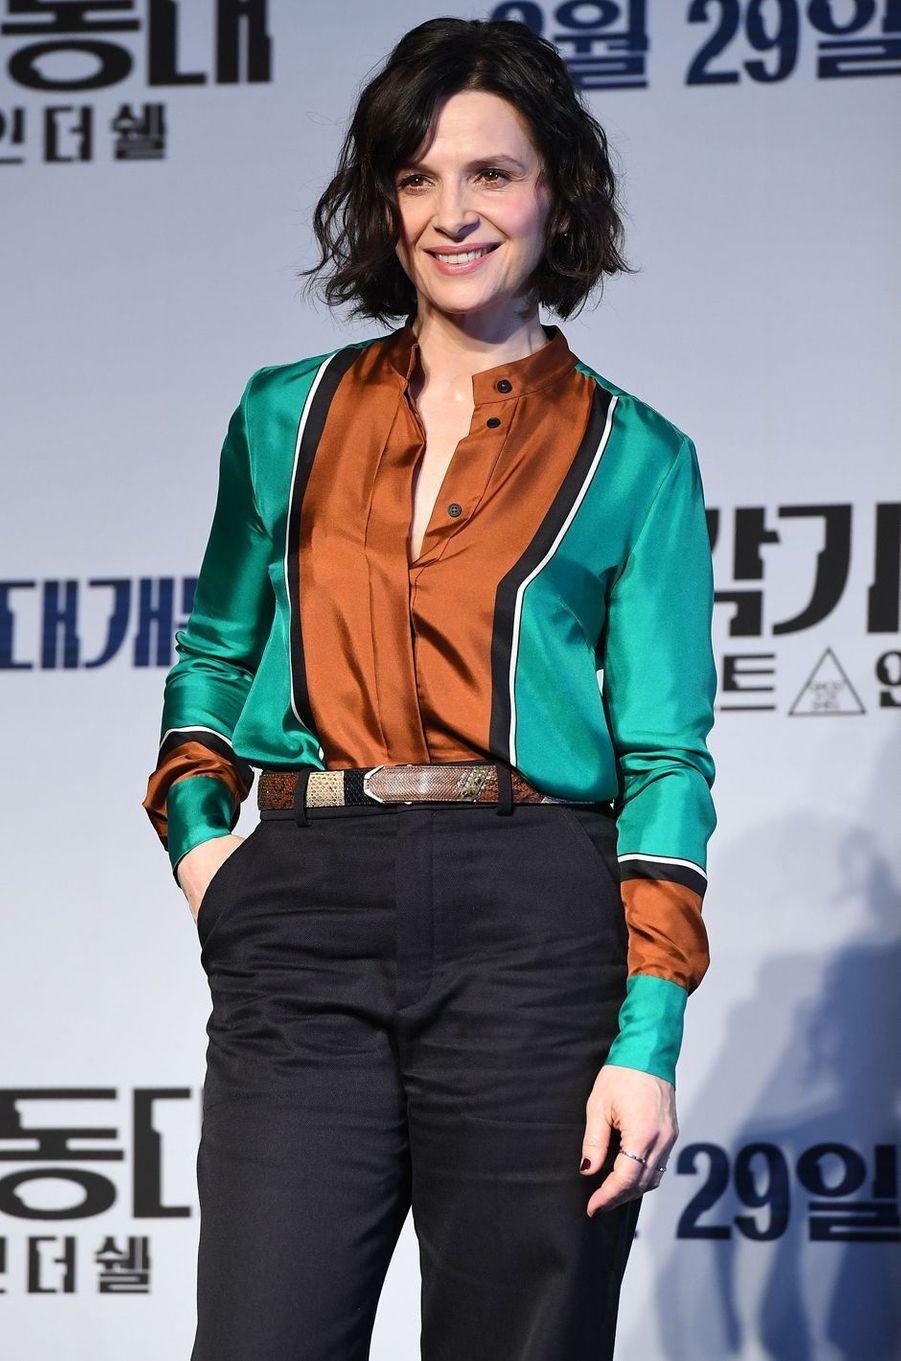 Juliette Binoche à Séoul, le 17 mars 2017.